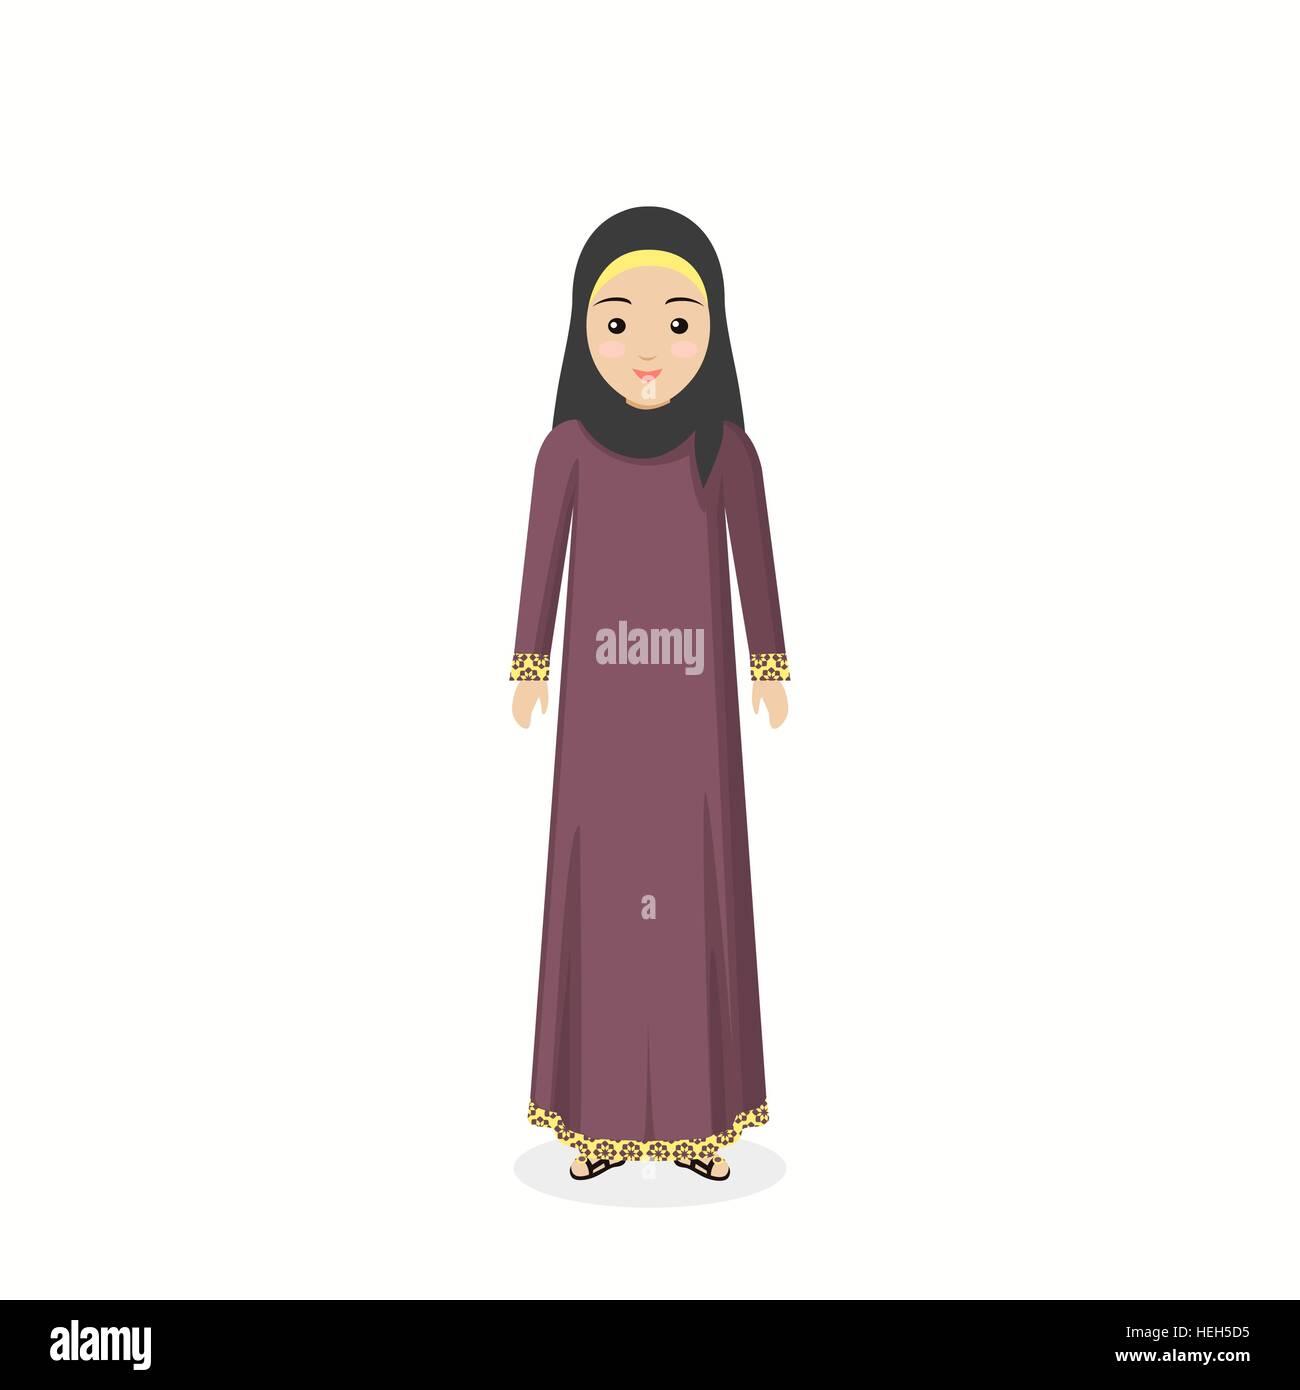 7a9de1b91 Arabian ropa tradicional pueblo. Tradicional árabe musulmán, árabe ...